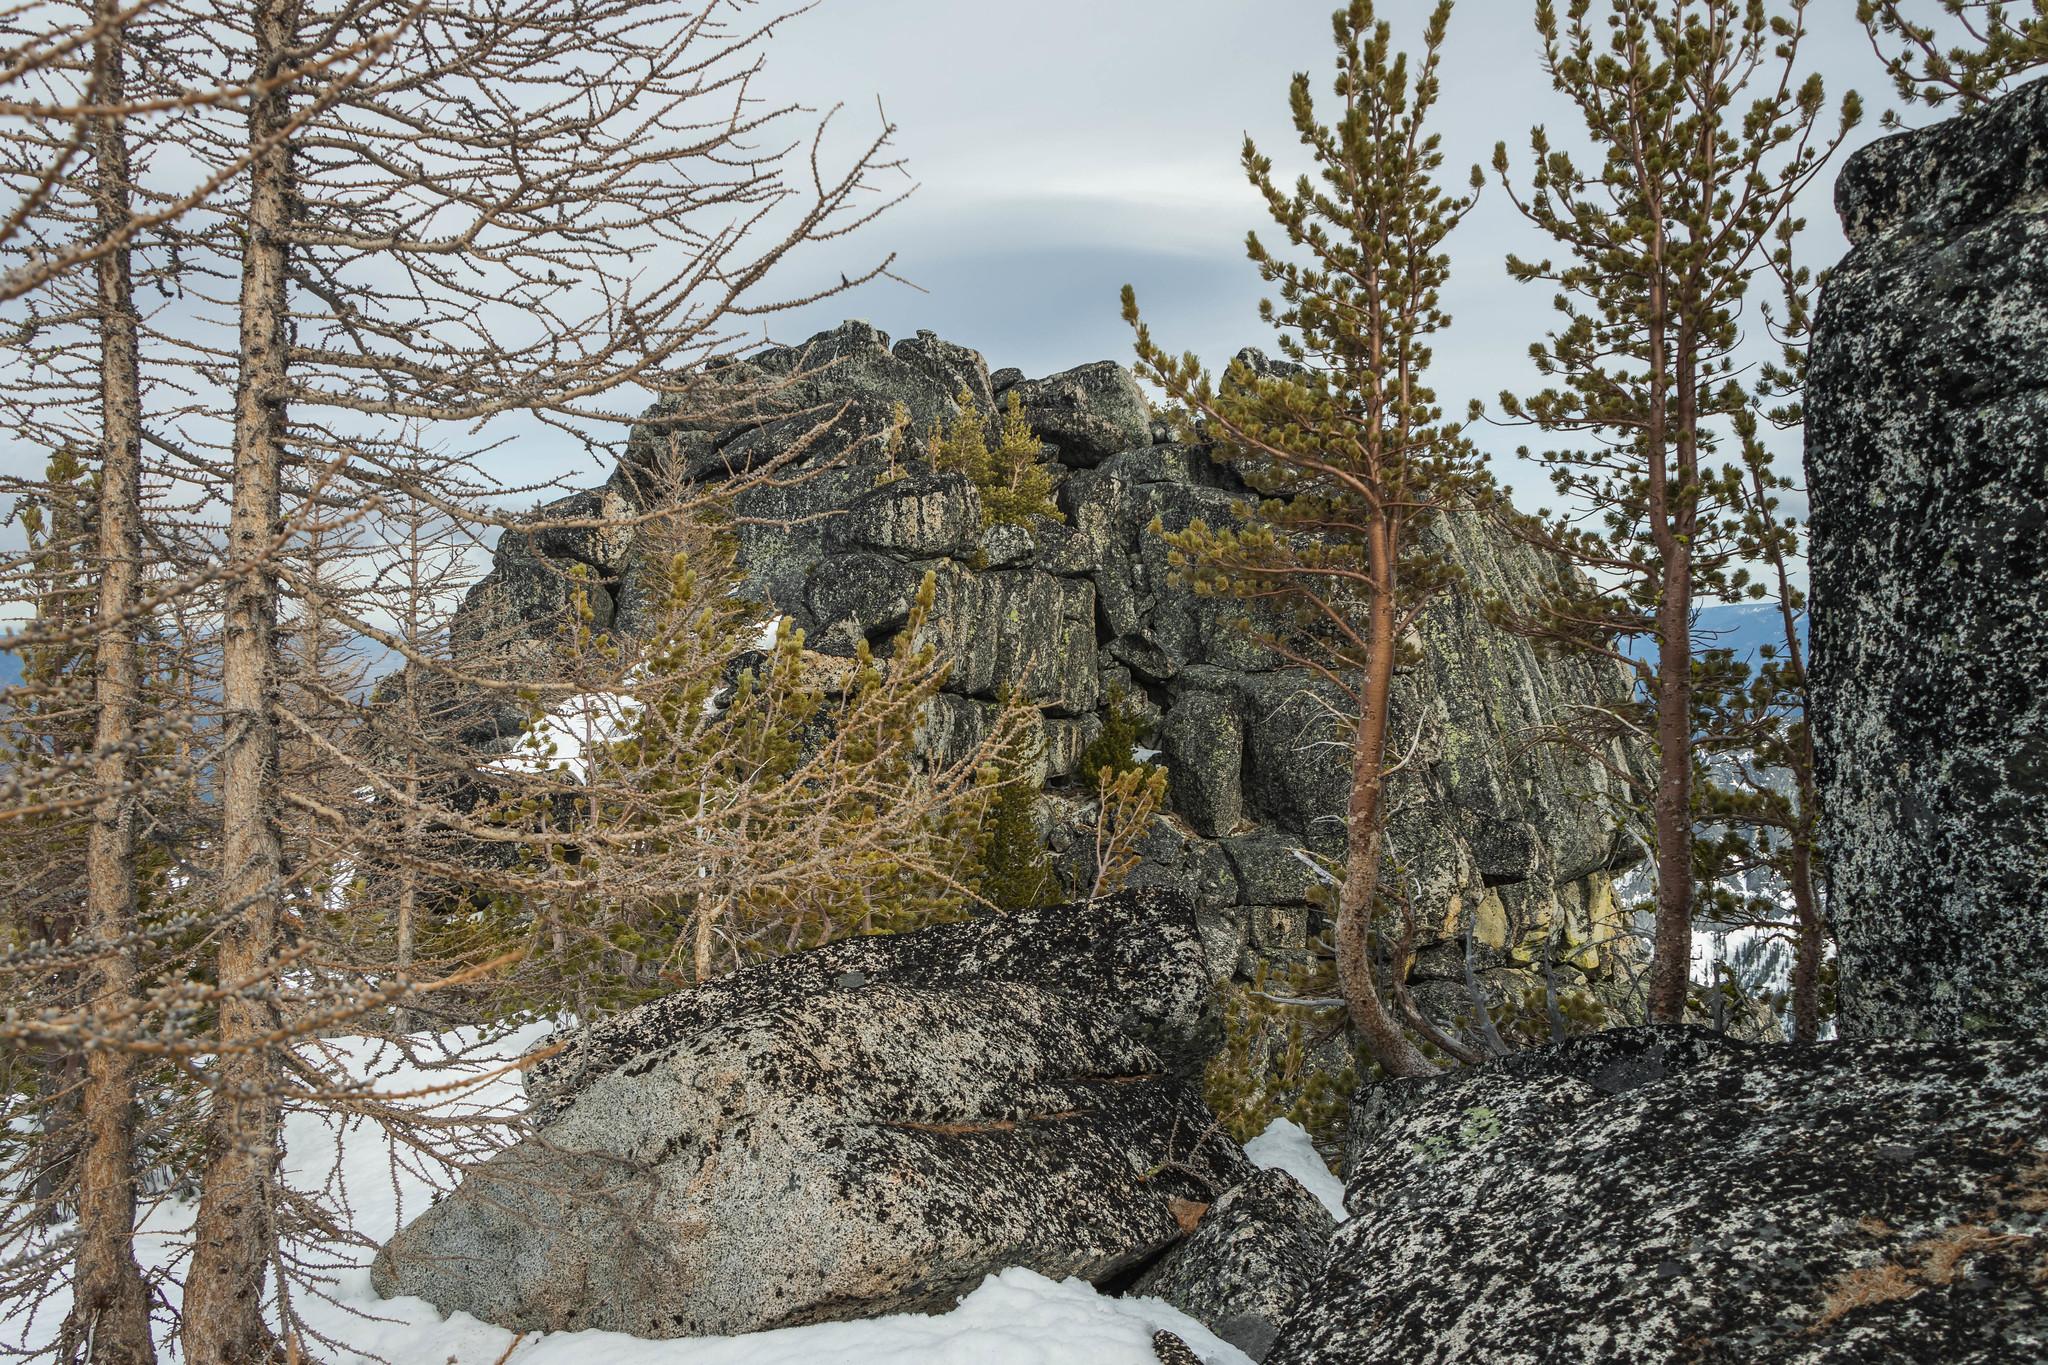 The actual summit on Three Musketeers Ridge